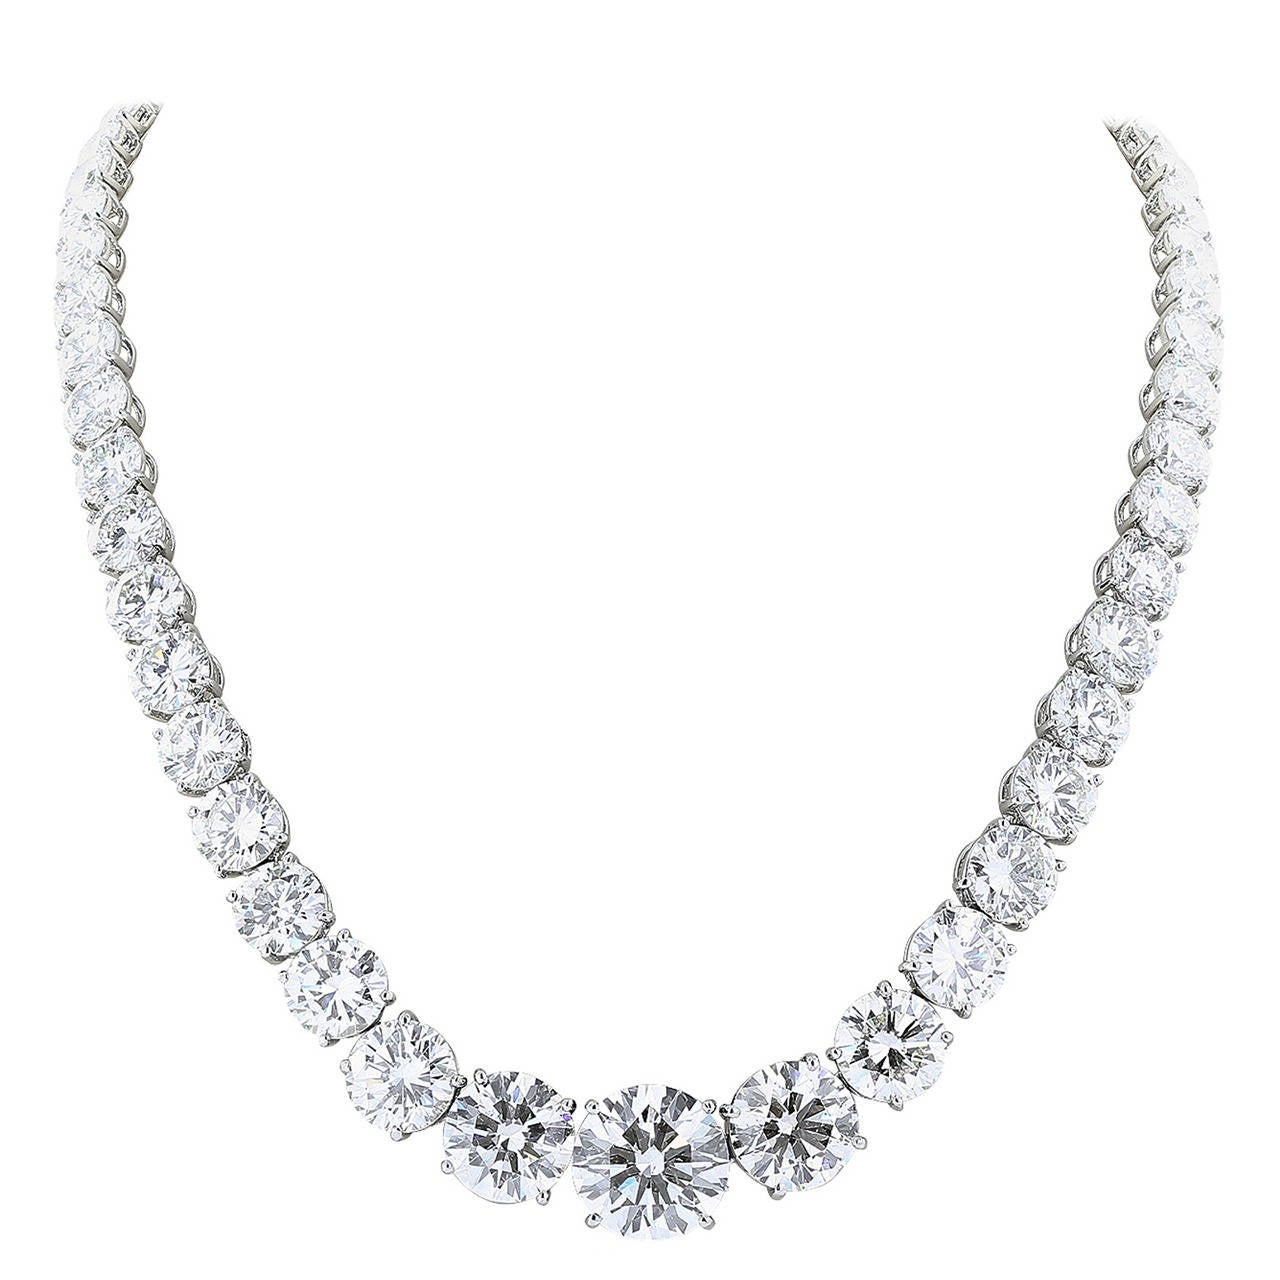 77.05 Carat Diamond Platinum Riviere Necklace For Sale